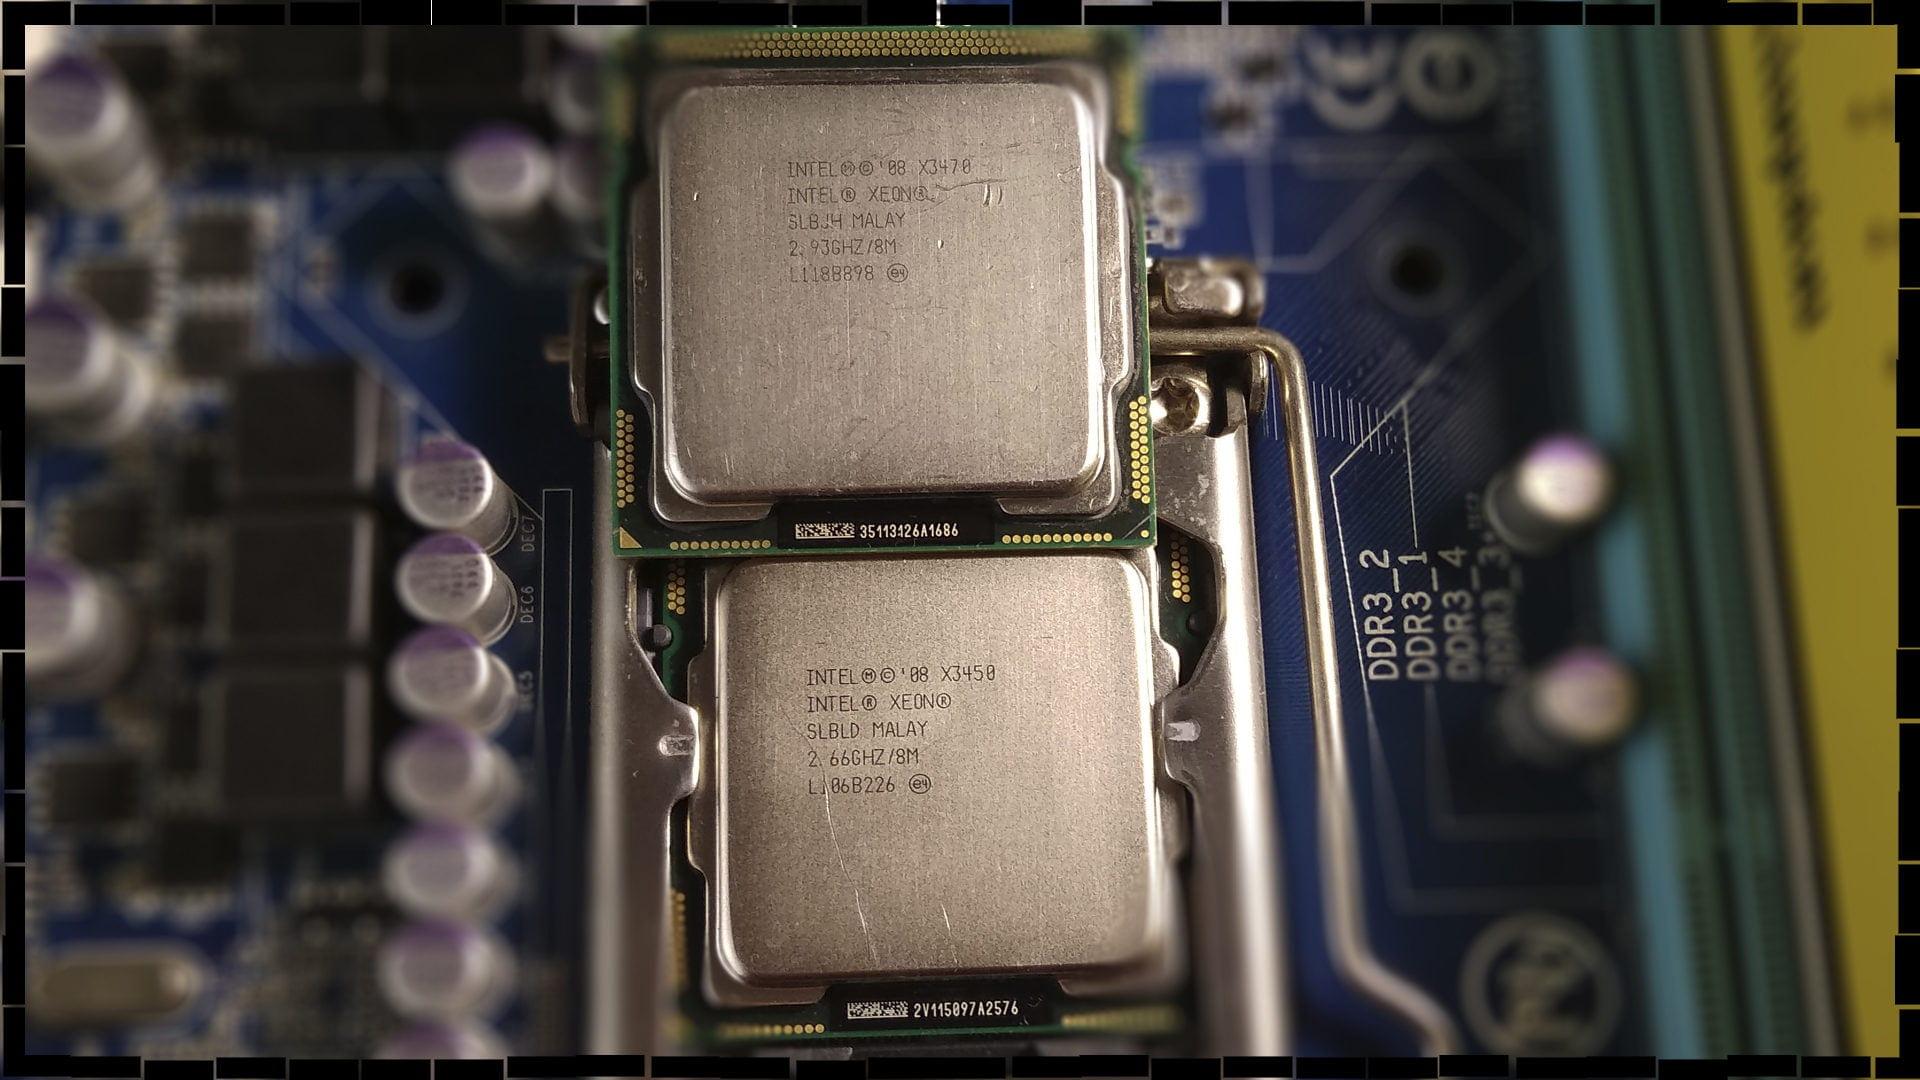 Обзор, разгон и тестирование процессоров Intel Xeon X3450 и Xeon X3470 + бонус тест Xeon X5570